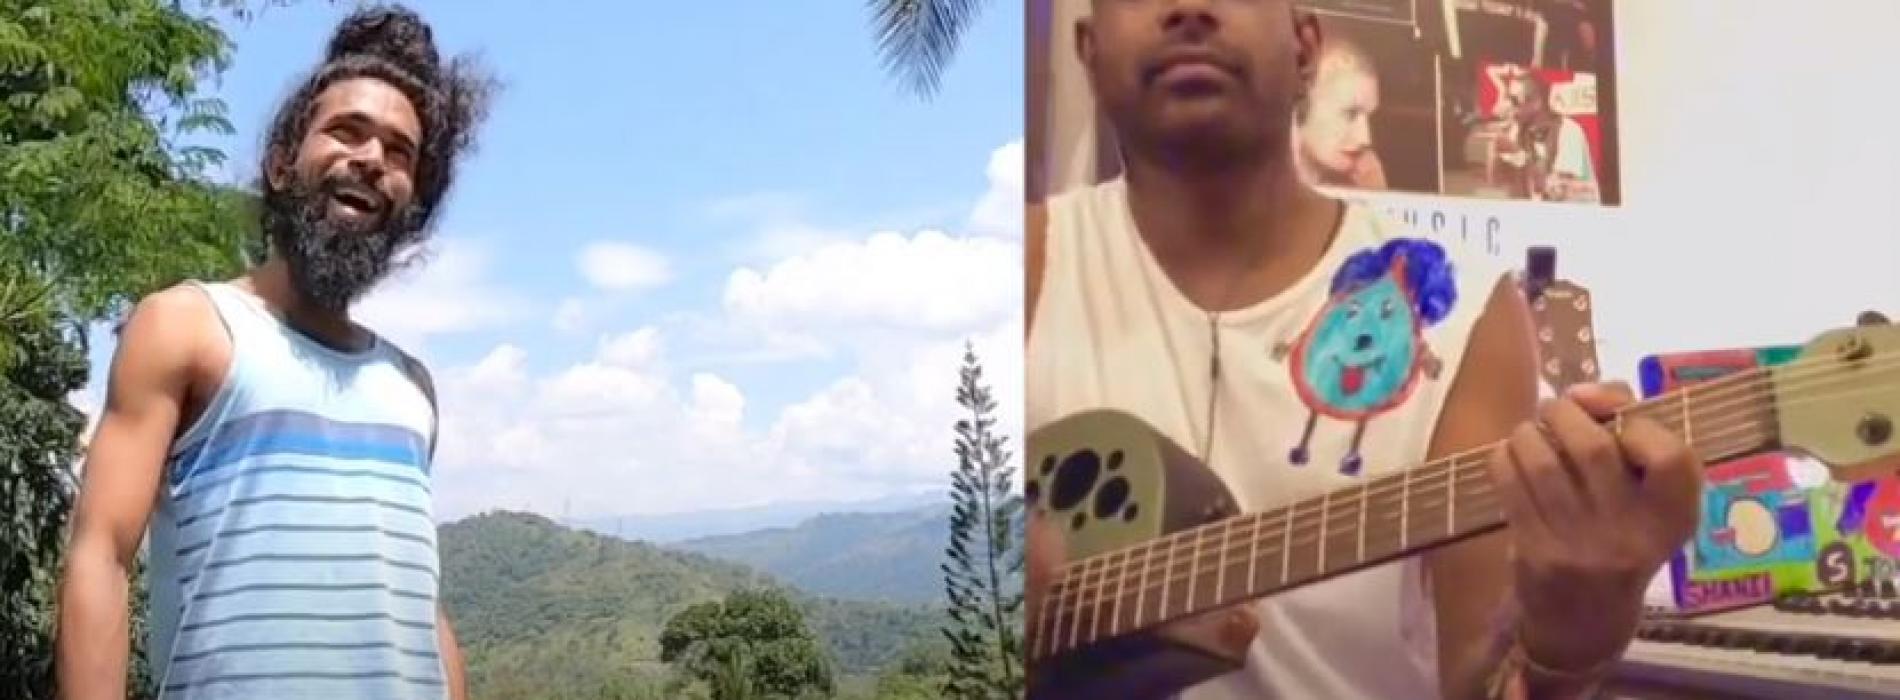 Ulath Ekai – Rookantha Goonathilake (Cover By Damien & Shane)